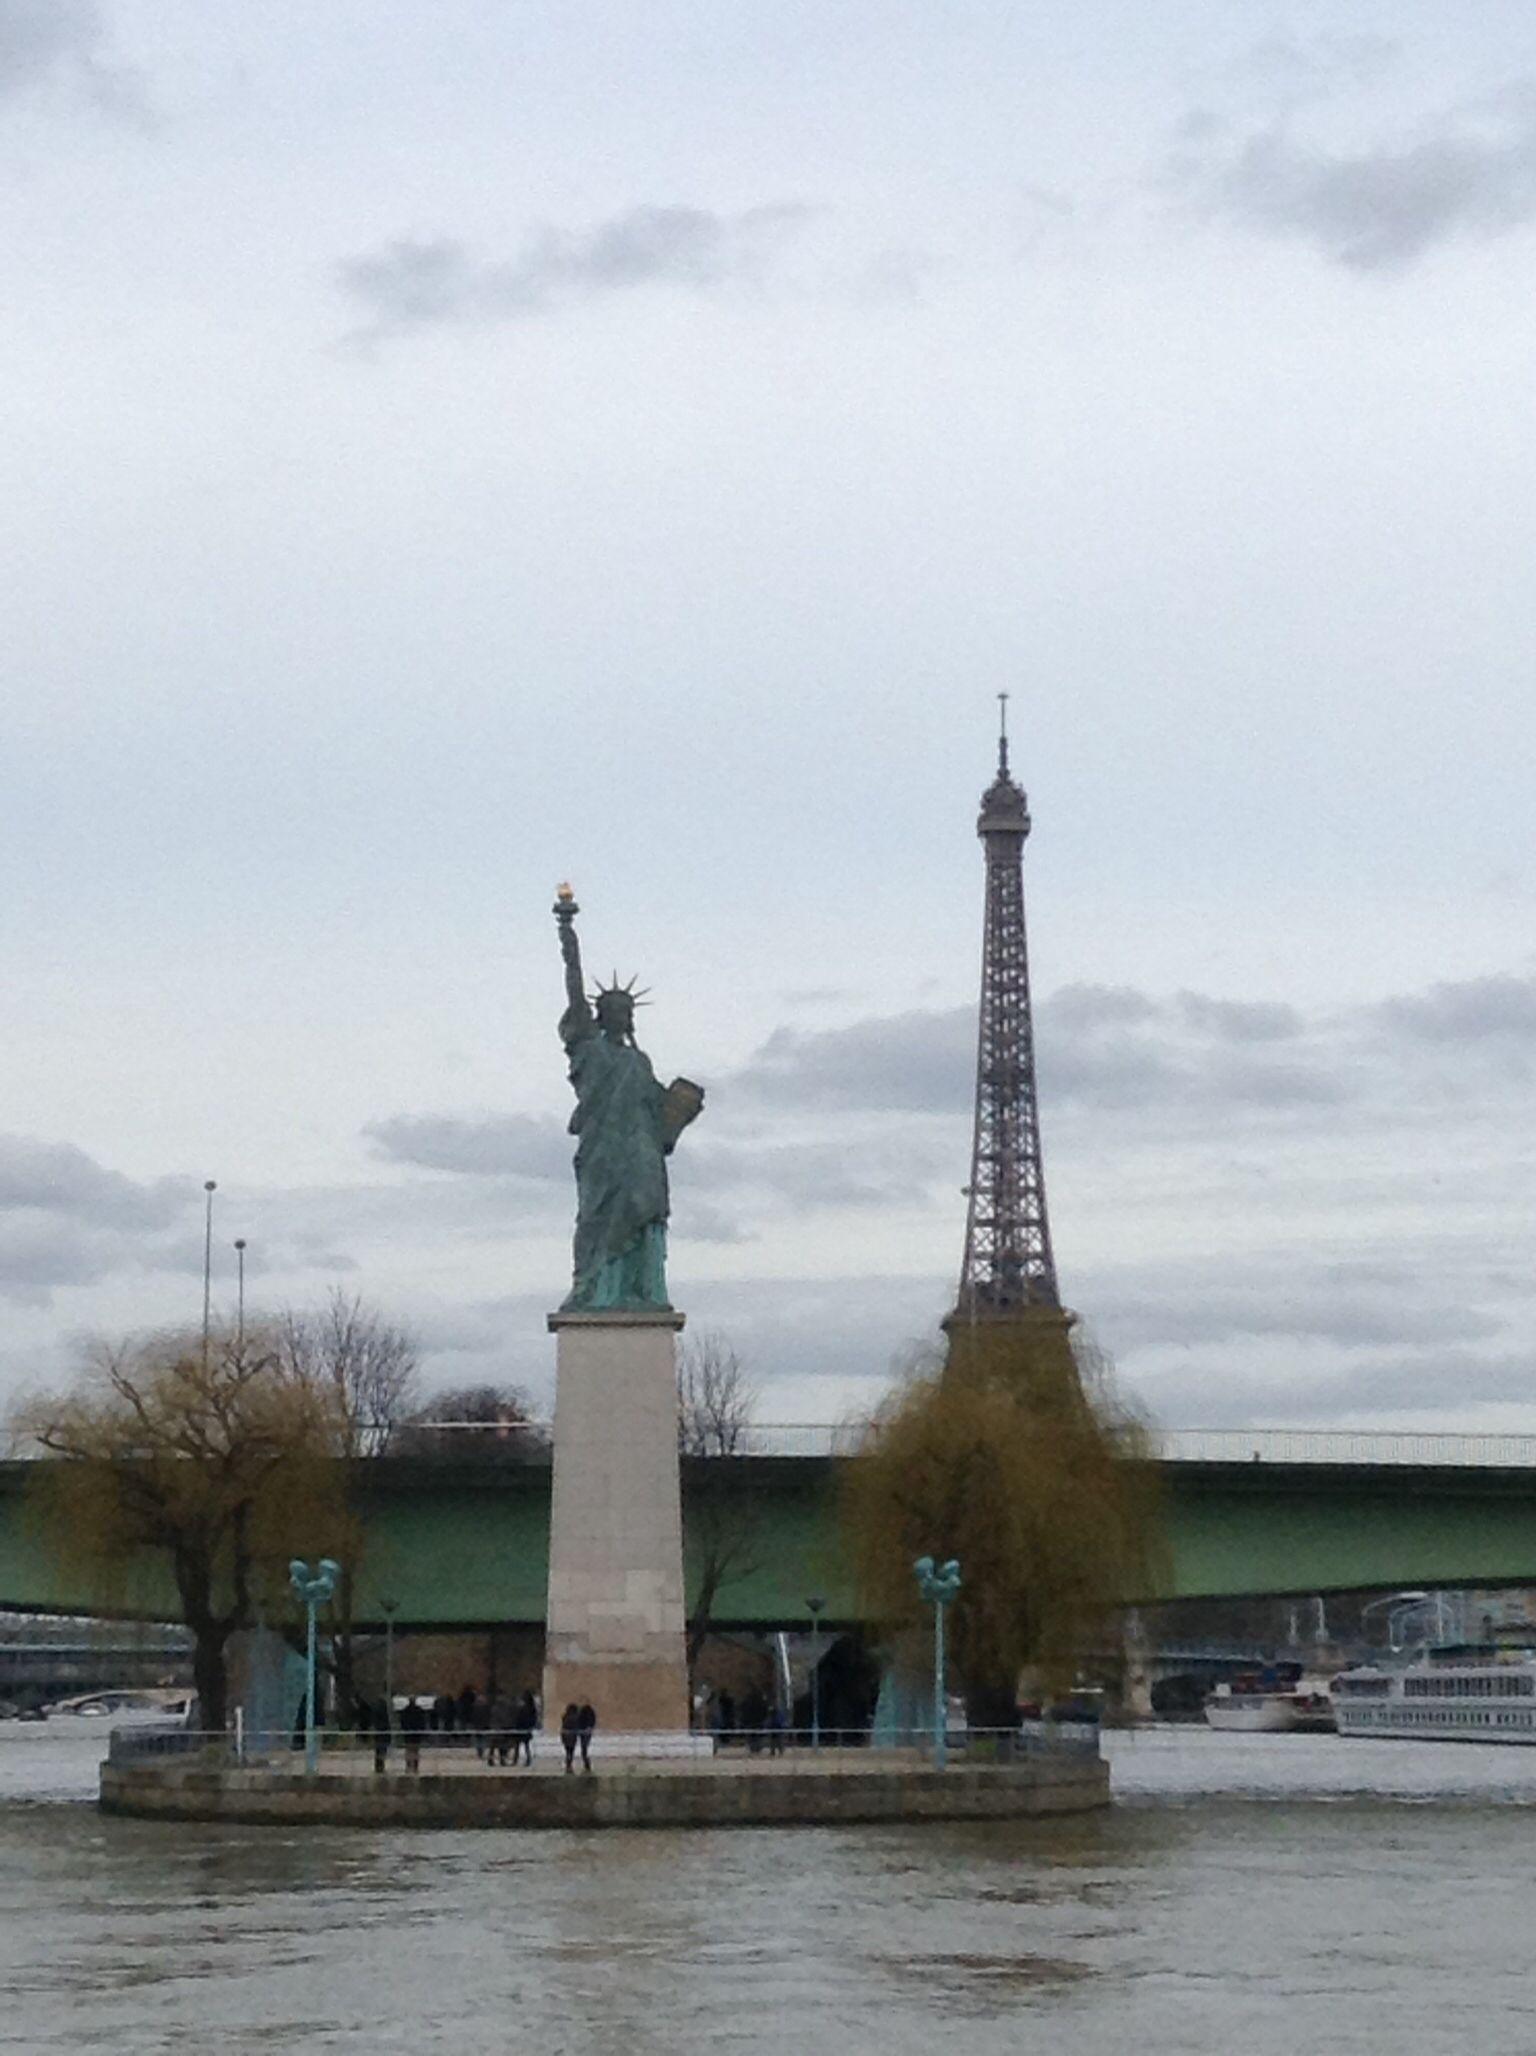 Seine River Cruise. March 2014.